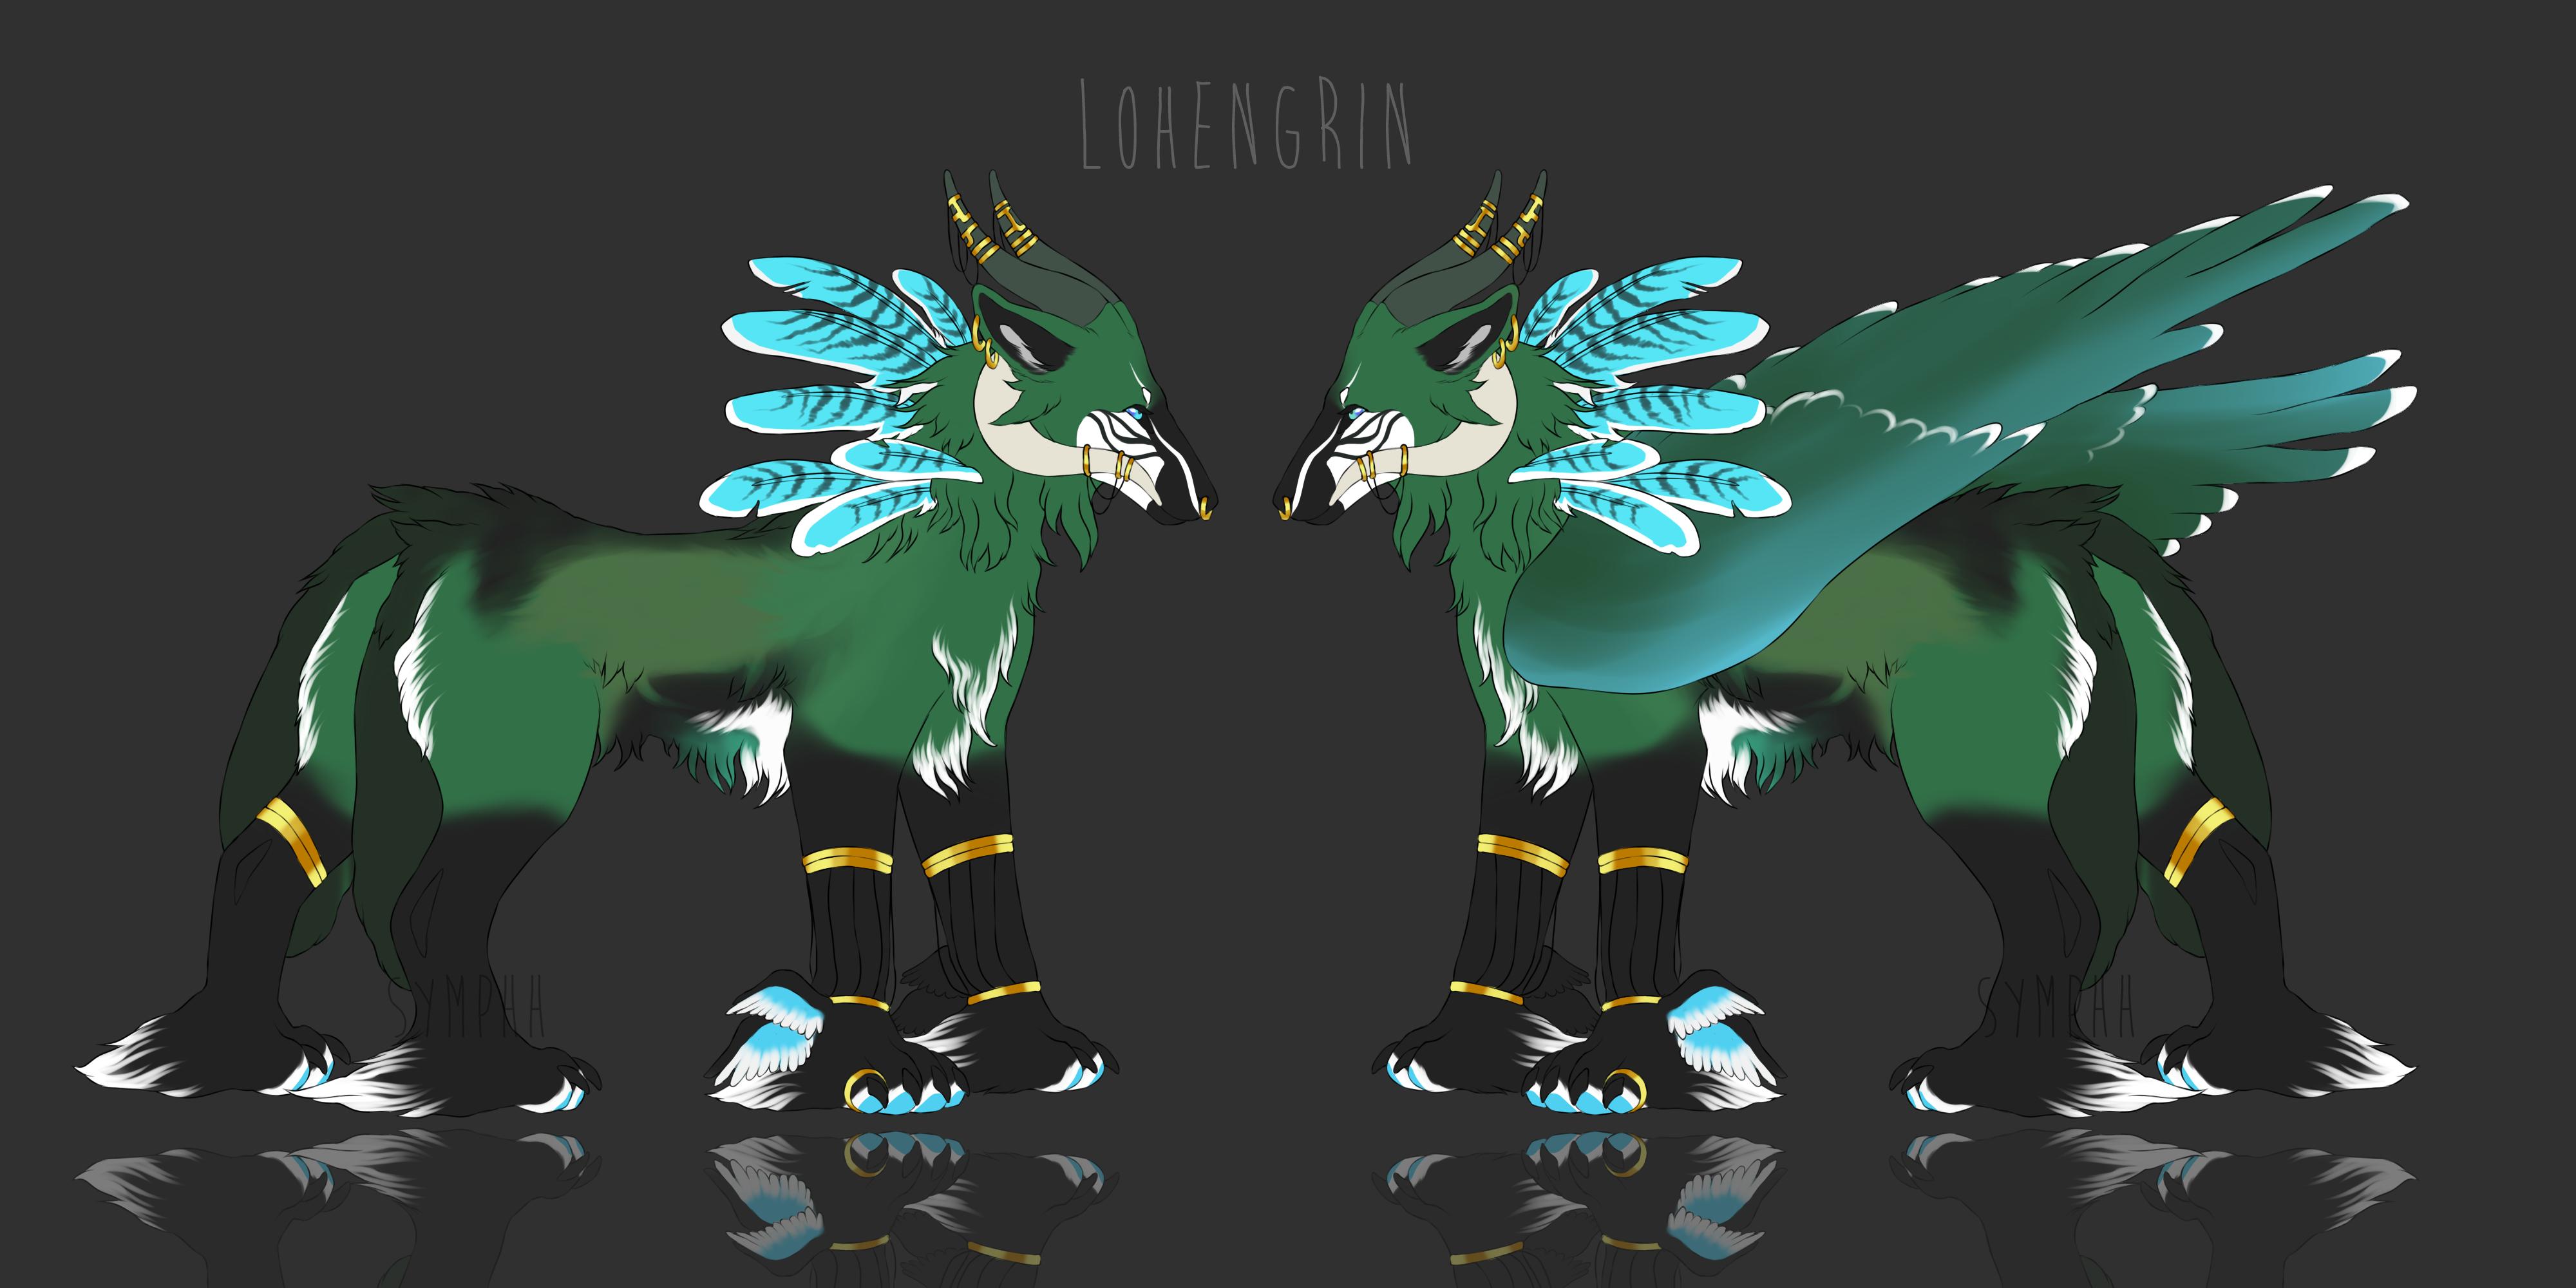 Lohengrin by symphh